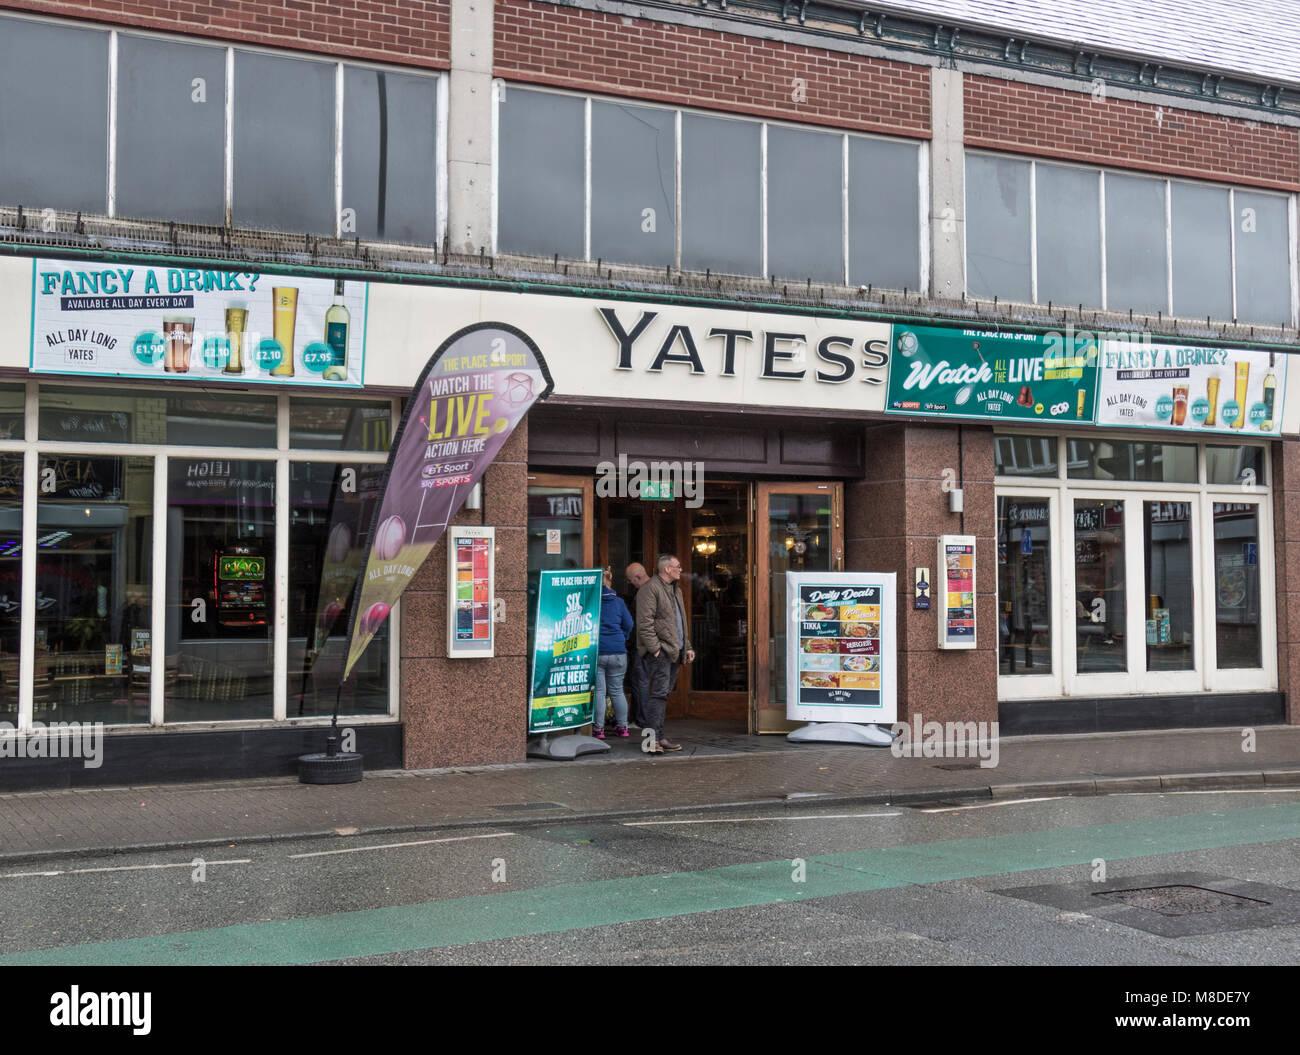 Yates's Wine Lodge, Leigh, Lancashire - Stock Image